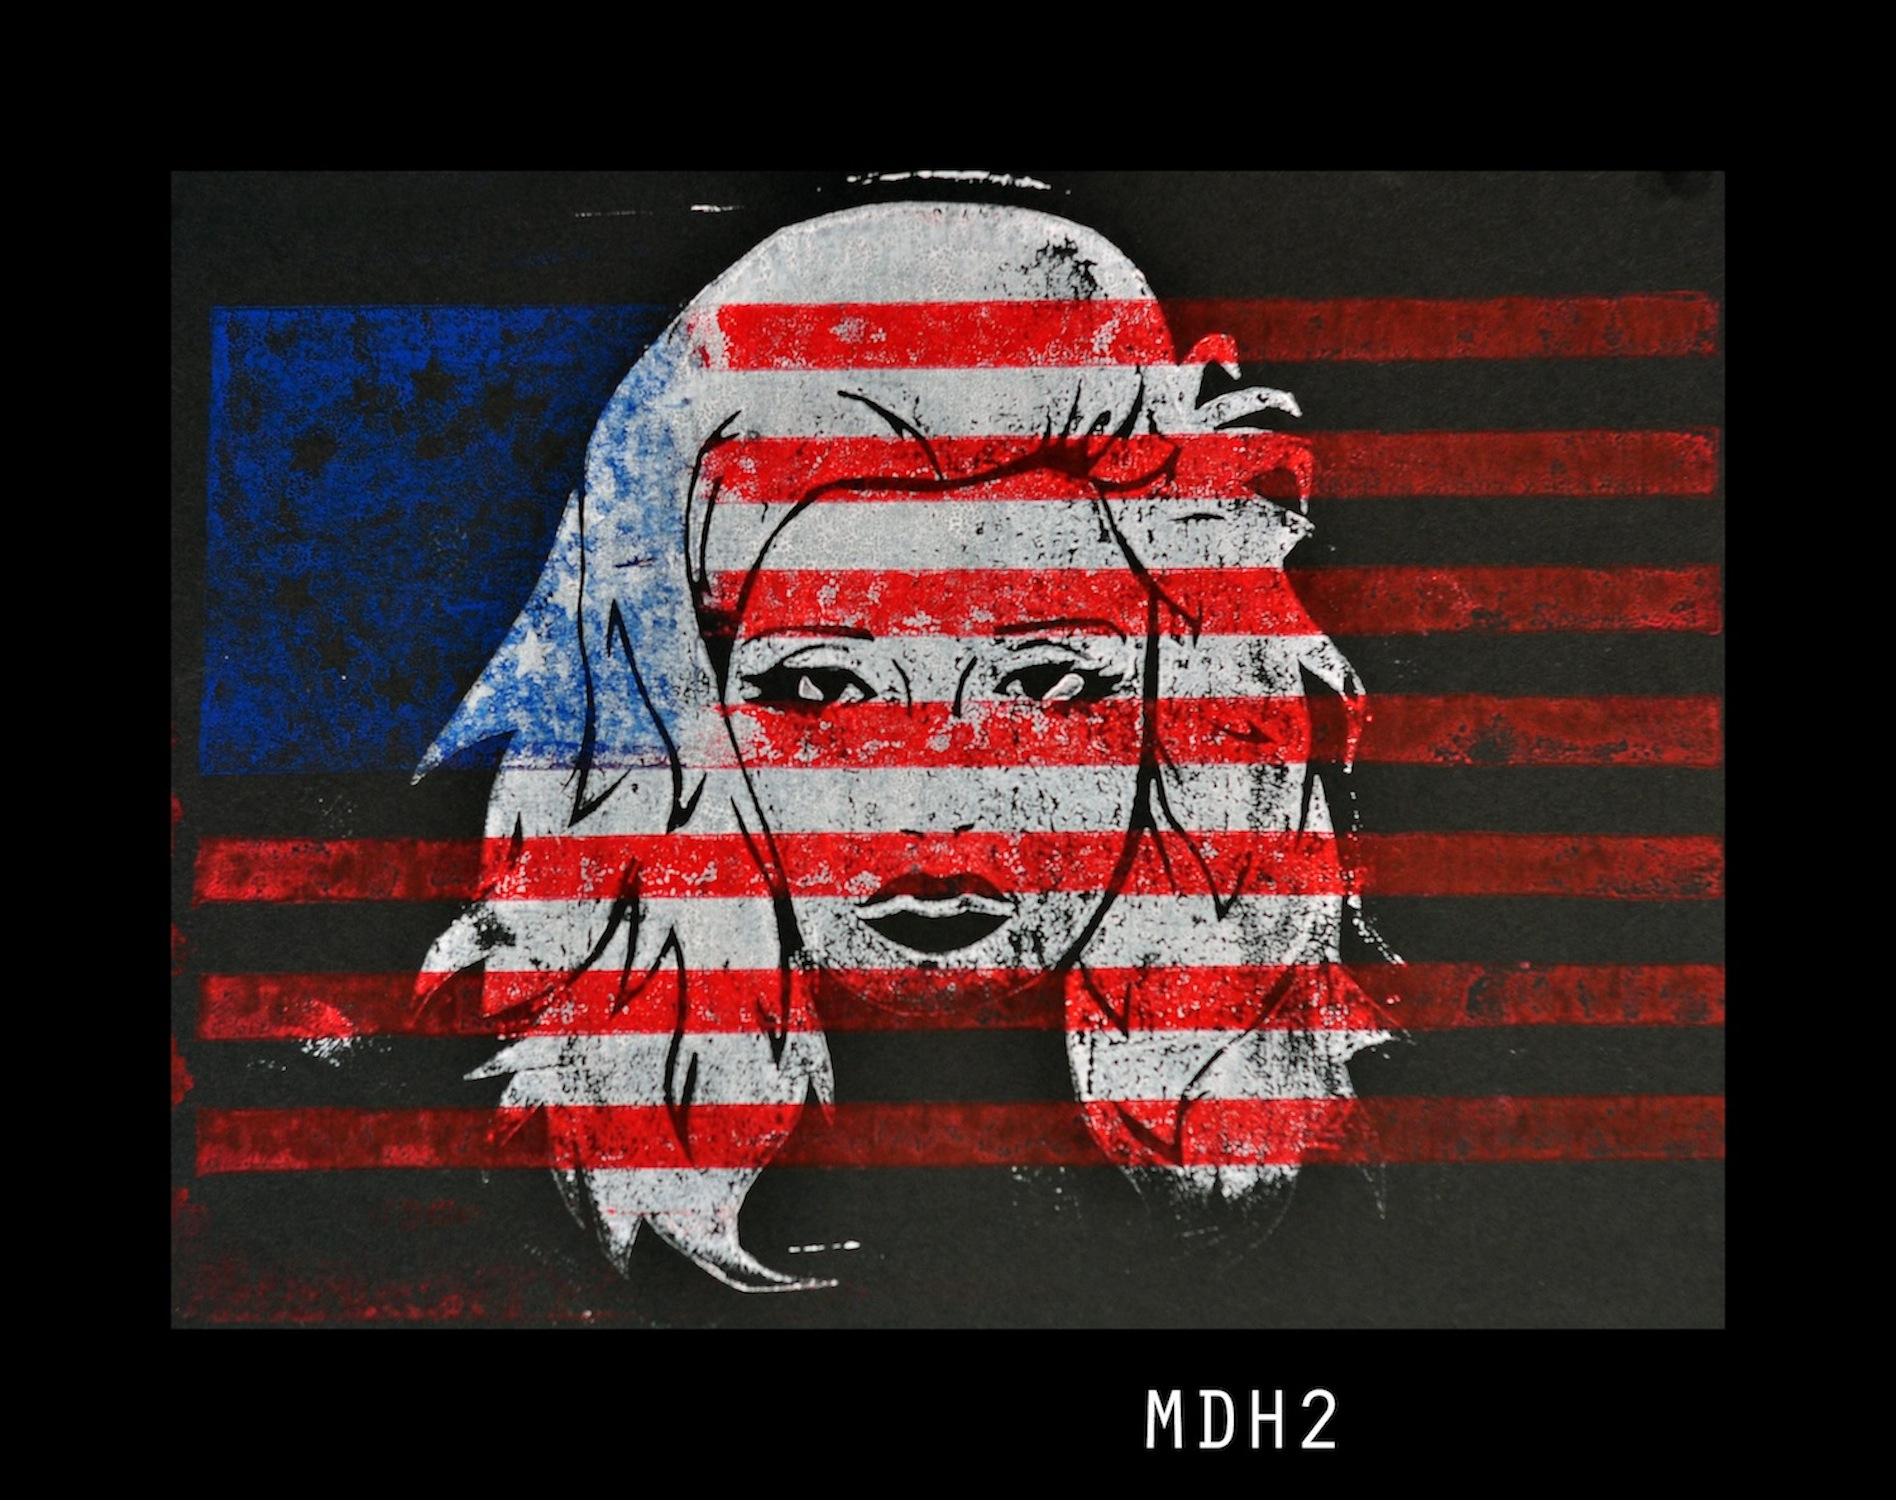 11-MDH2.JPG